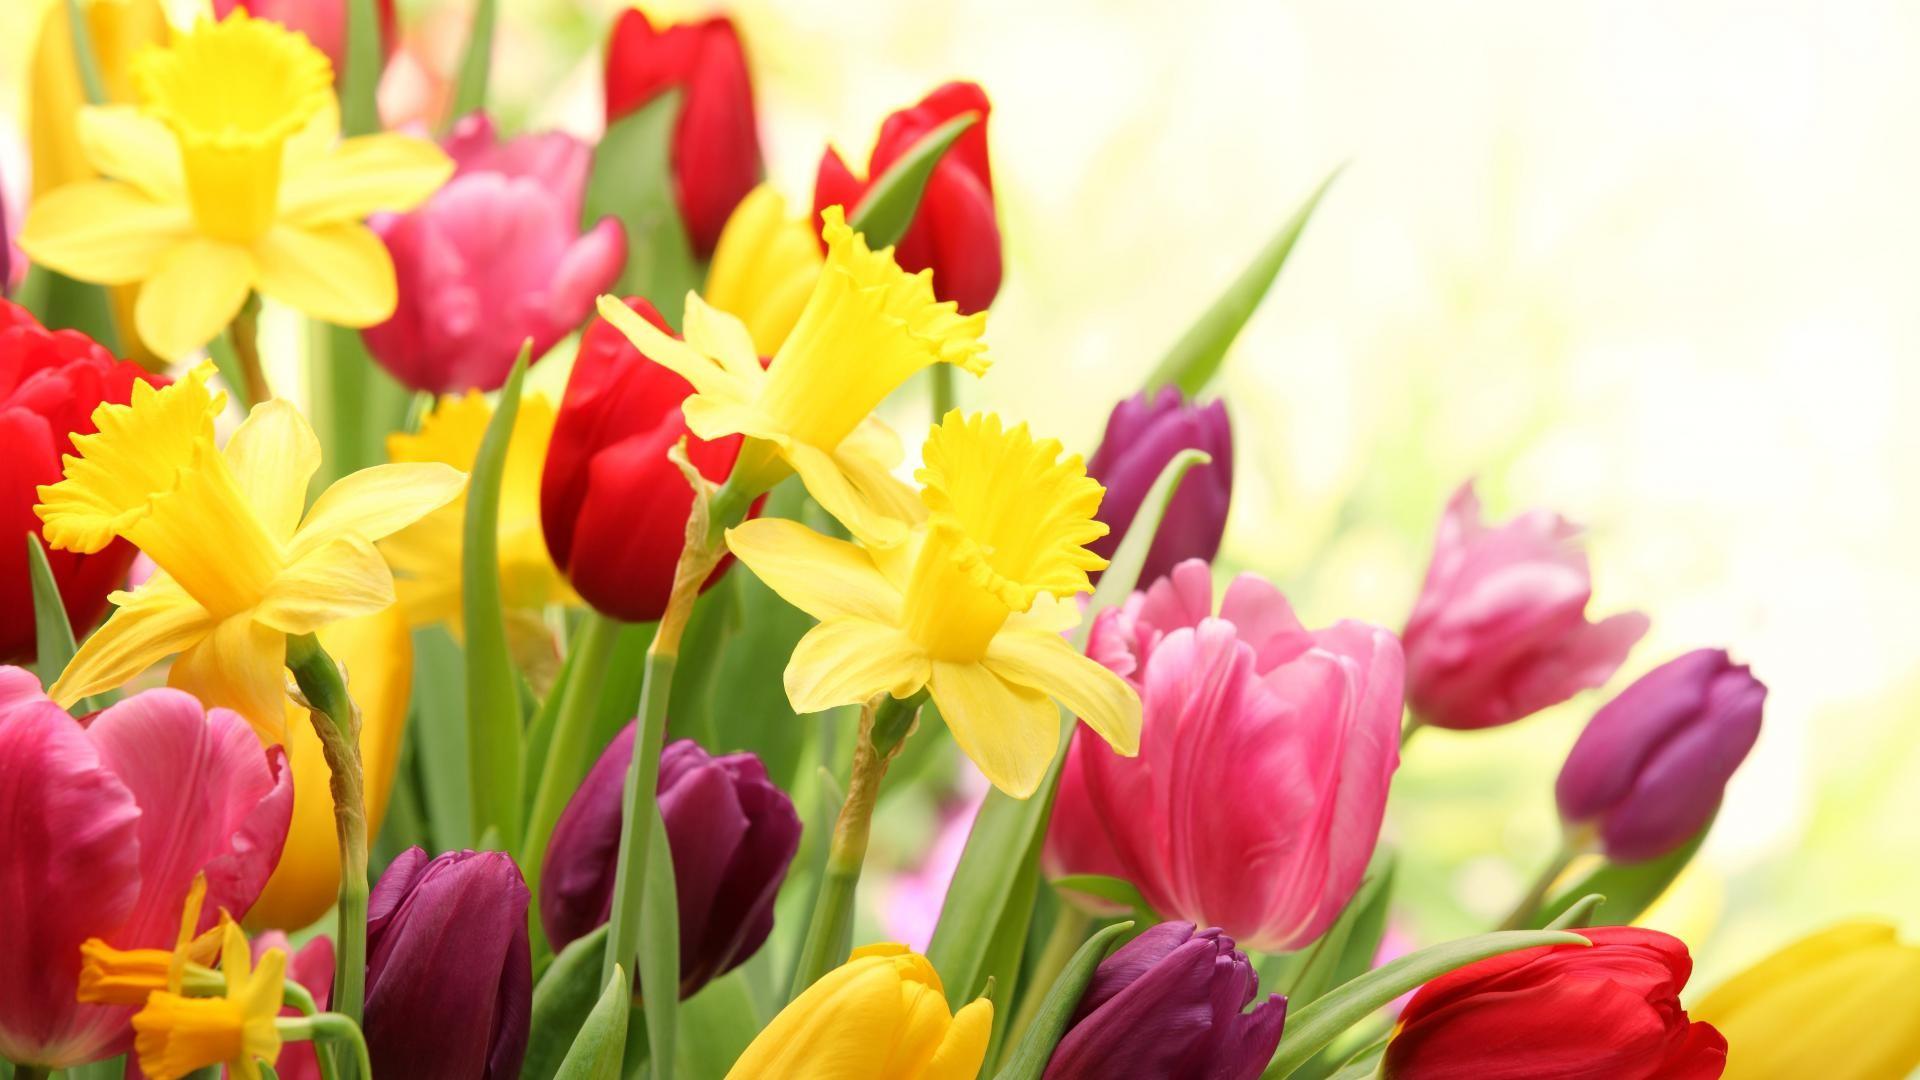 Res: 1920x1080, Explore More 4k Wallpapers. Spring Flowers Wallpapers Desktop